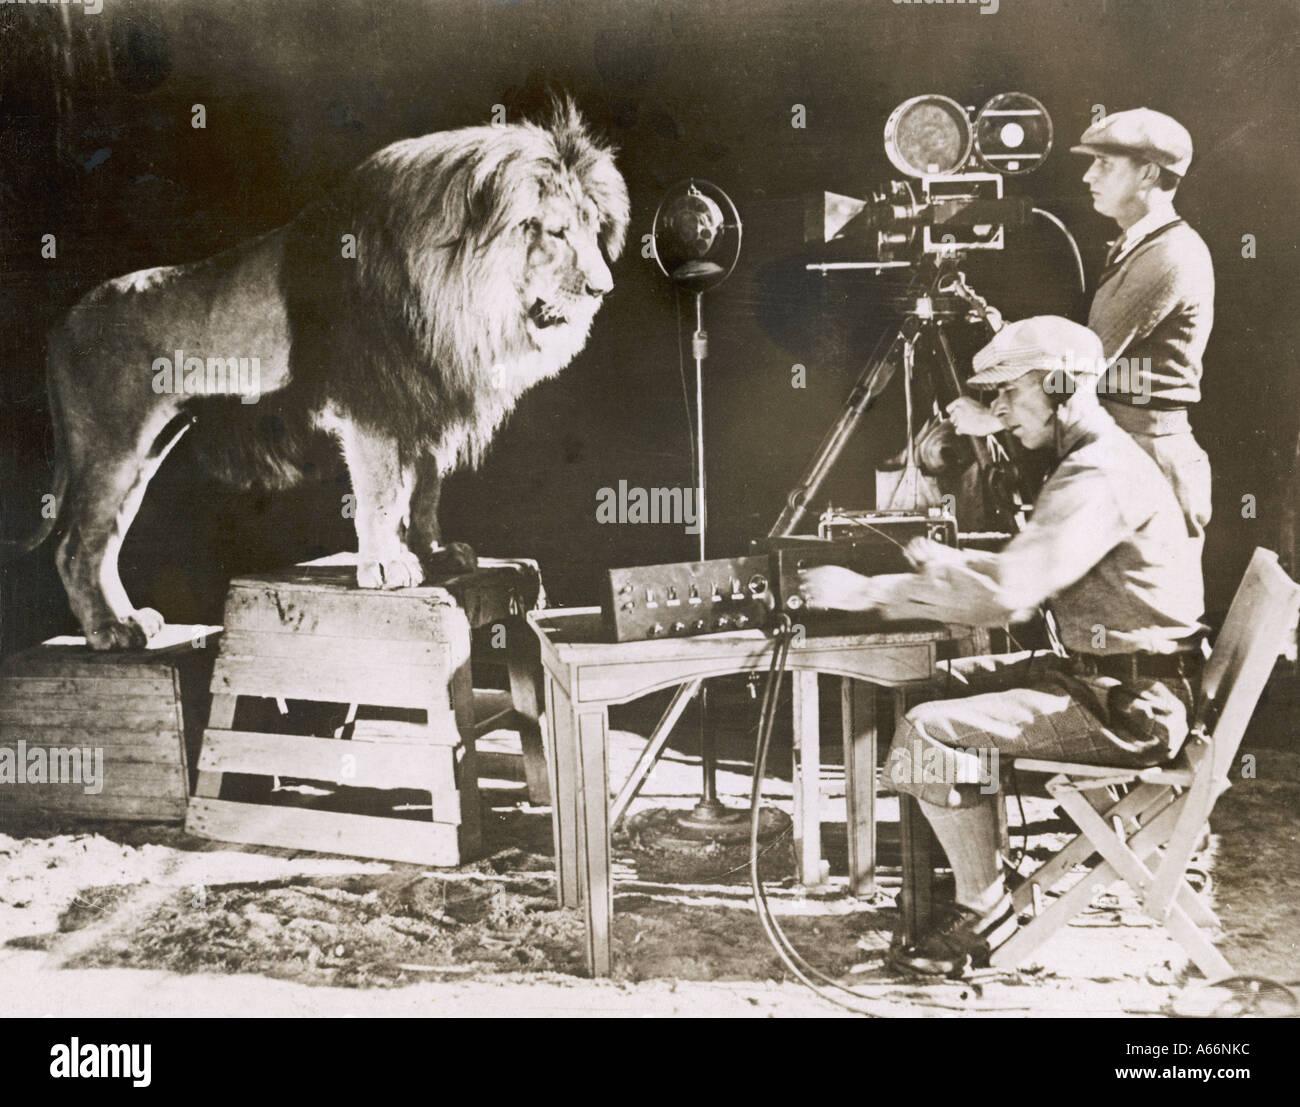 León de la MGM Imagen De Stock